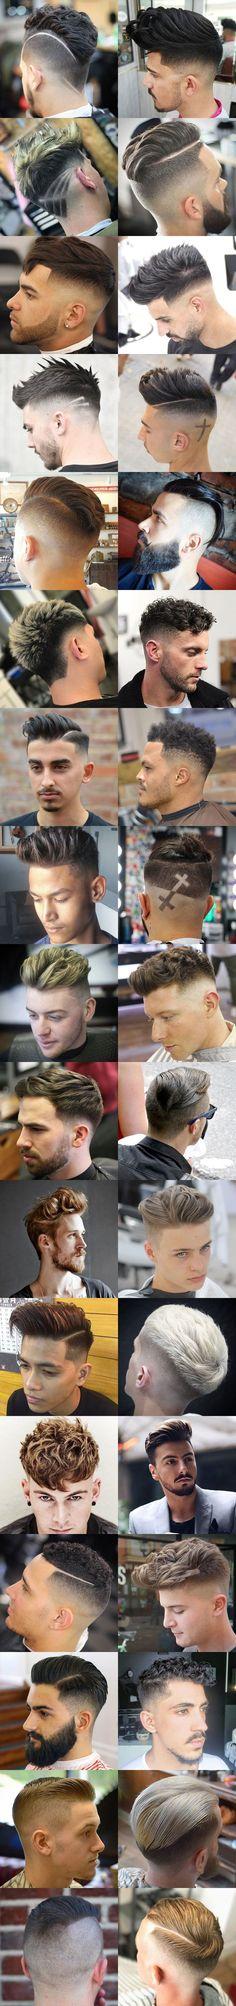 Cool Men's Hairstyles 2018 #menshairstyles2018